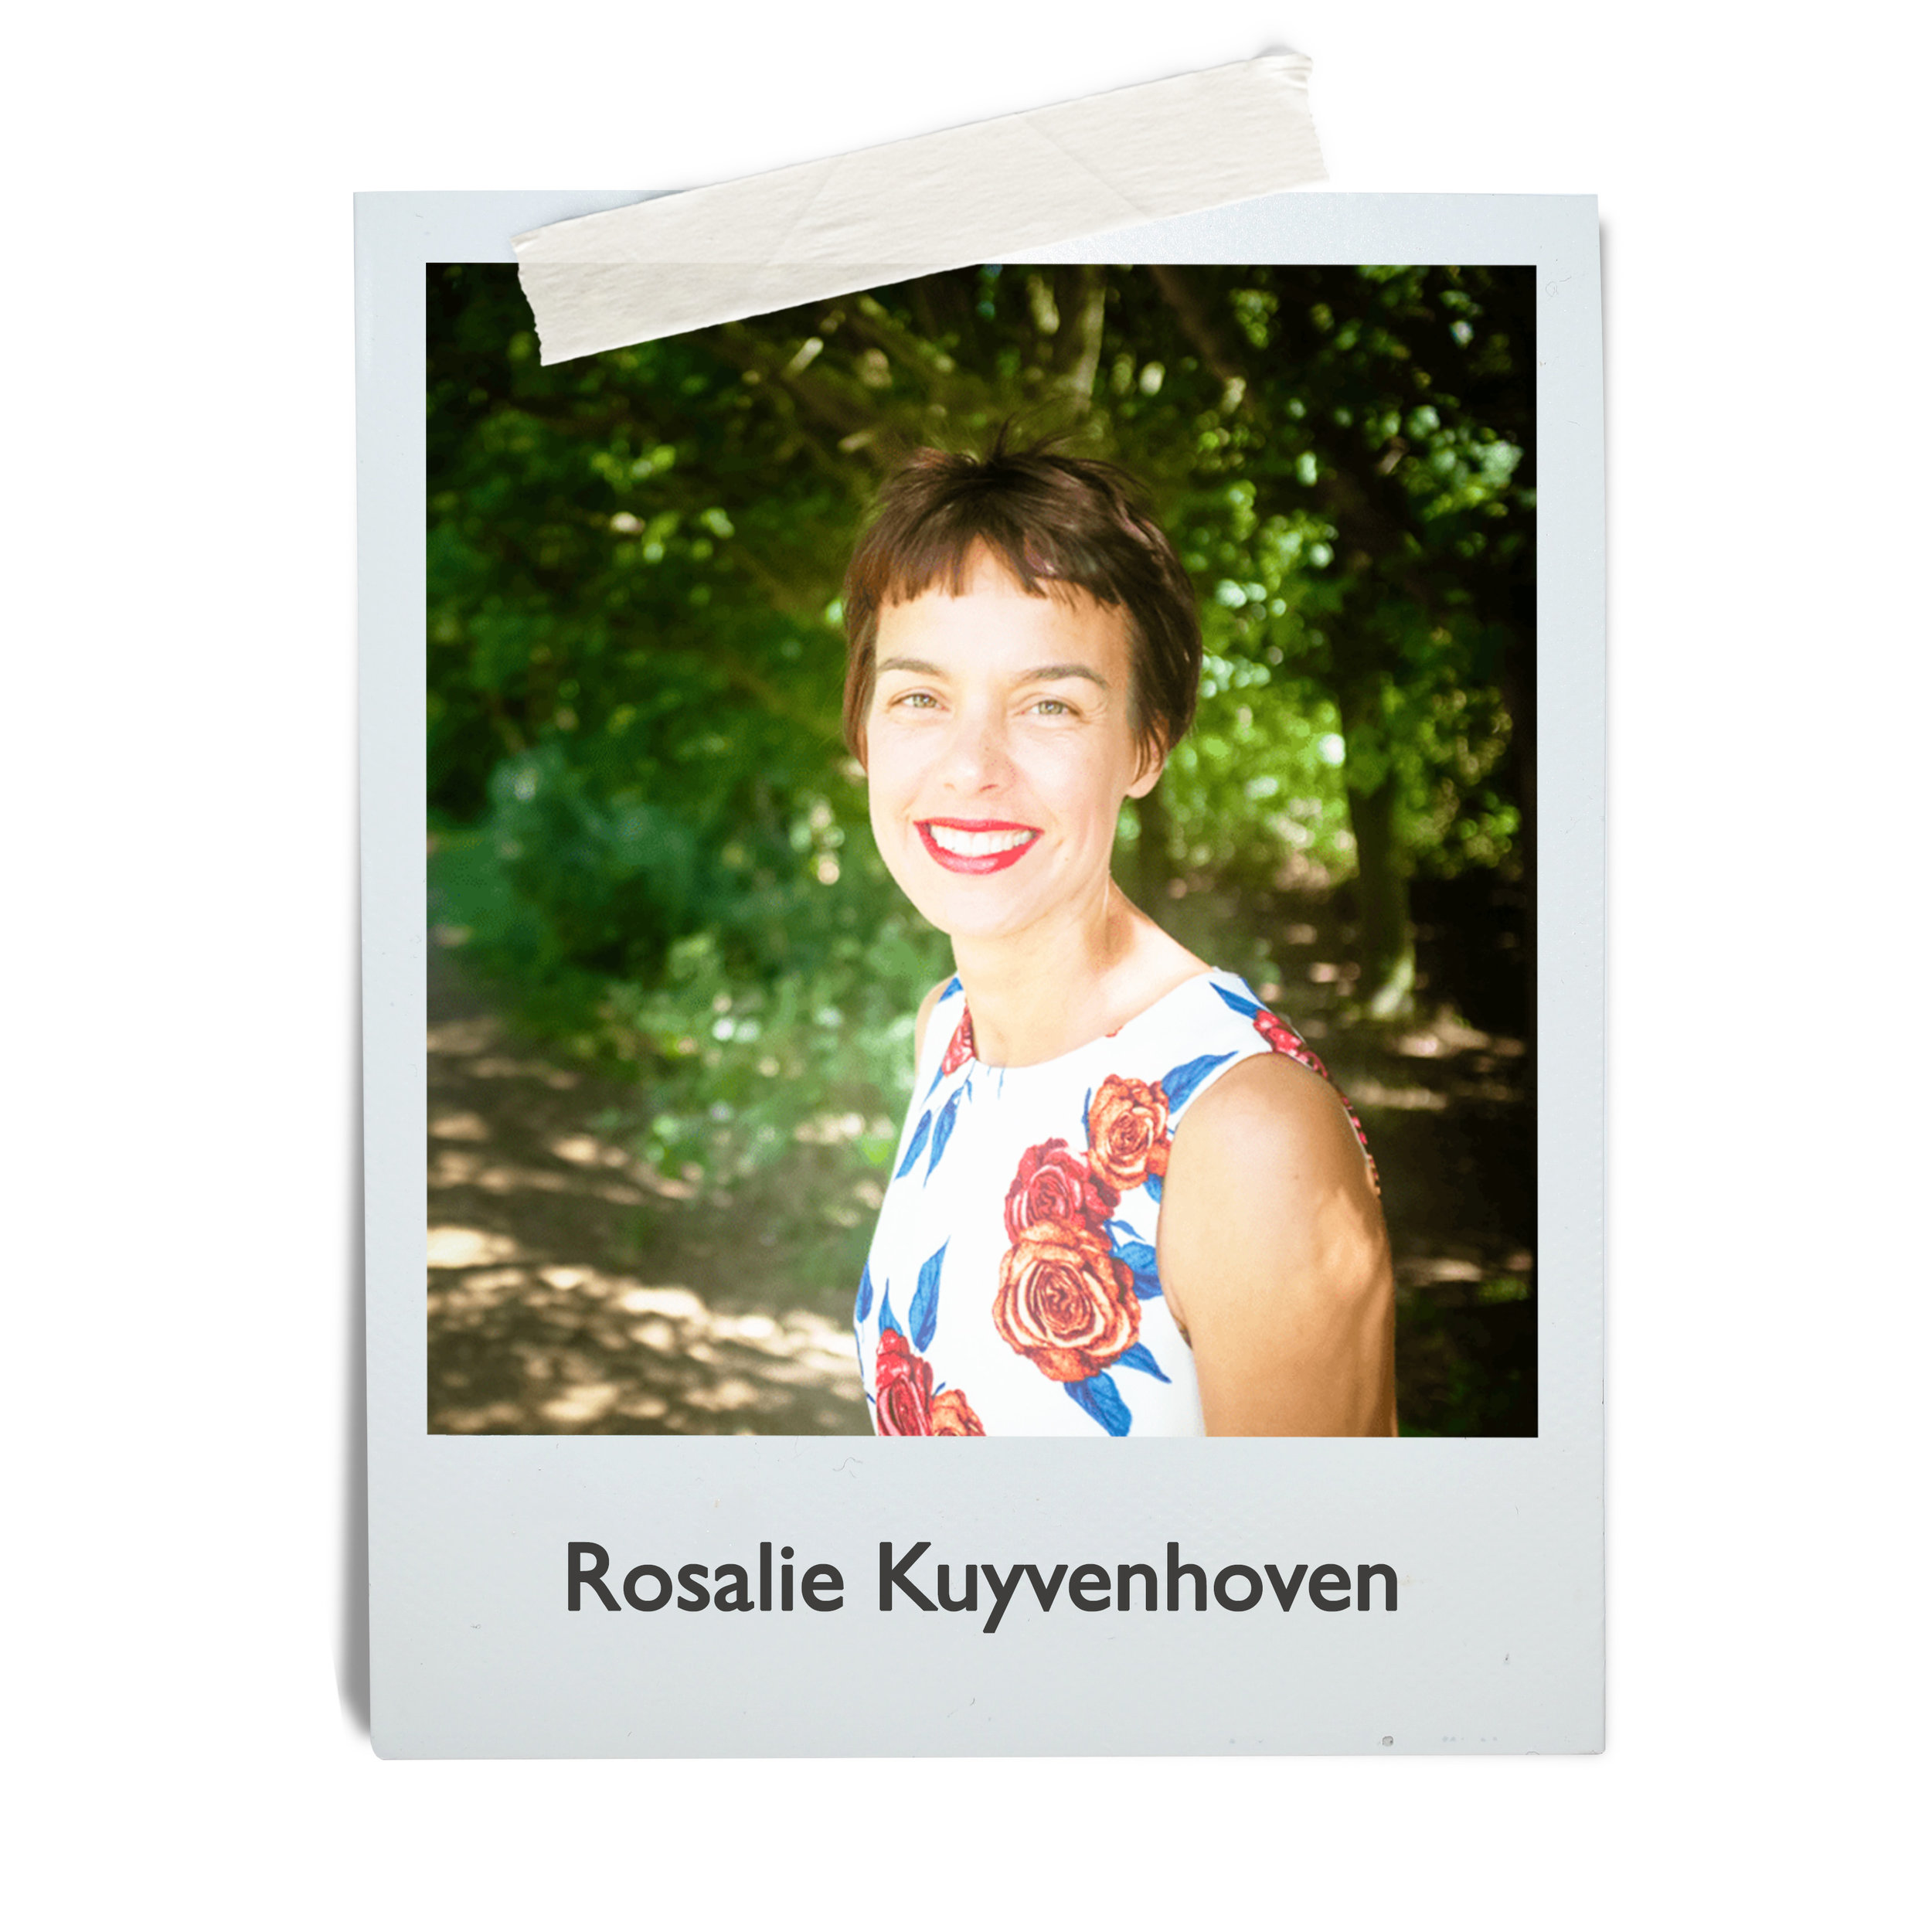 Rosalie Kuyvenhoven